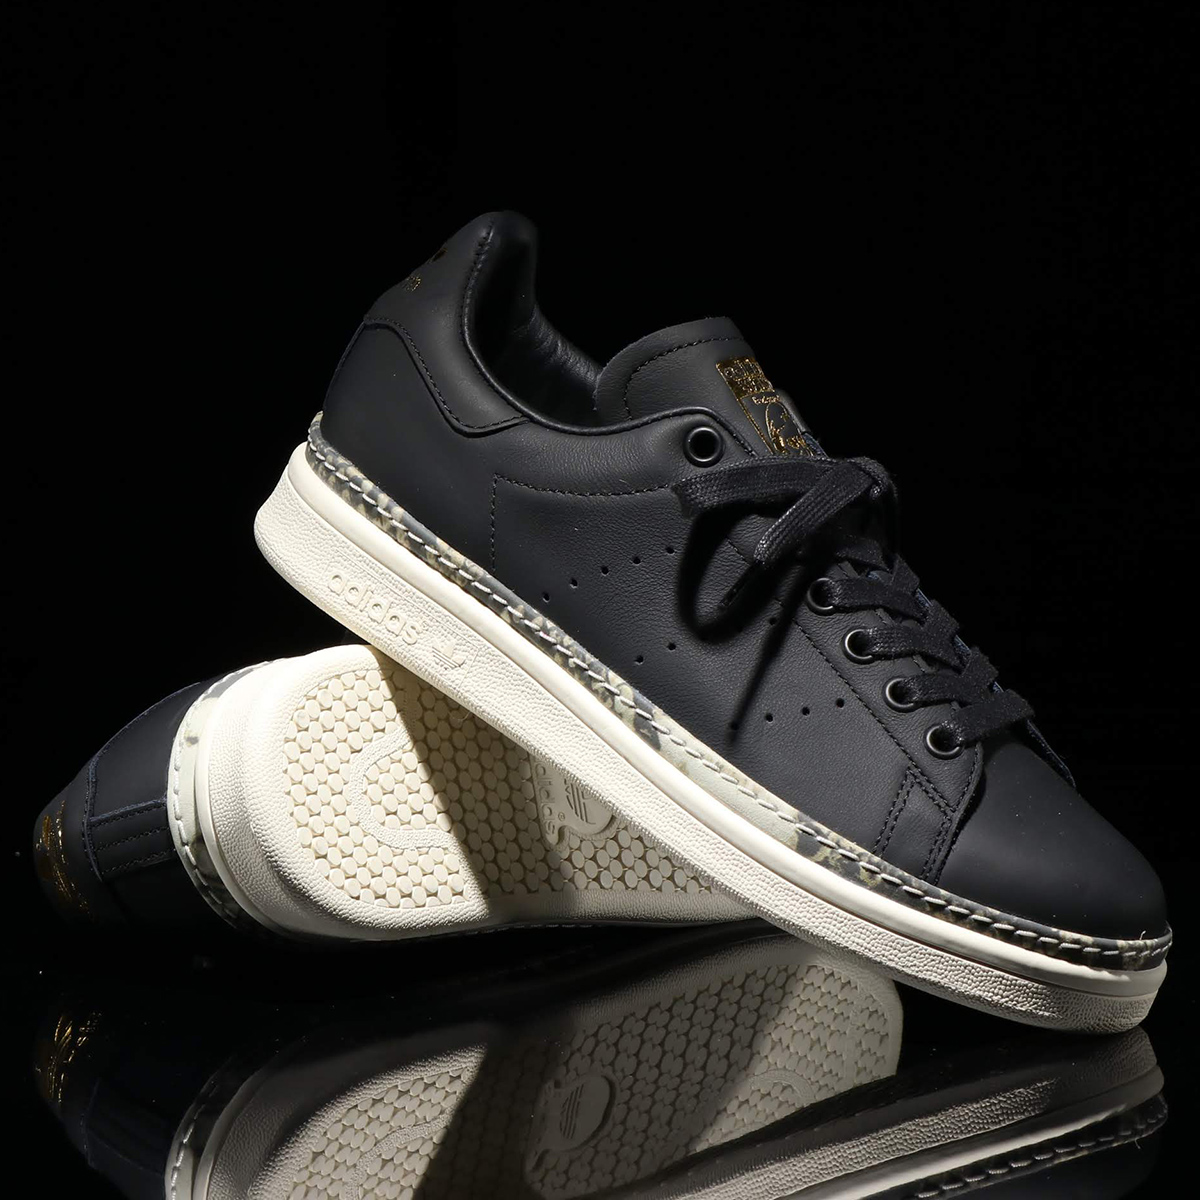 adidas Originals STAN SMITH NEW BOLD W(アディダスオリジナルス スタンスミス ニュー ボールド W)CORE BLACK/OFF WHITE/SUPPLIER COLOR【レディース スニーカー】19SS-I